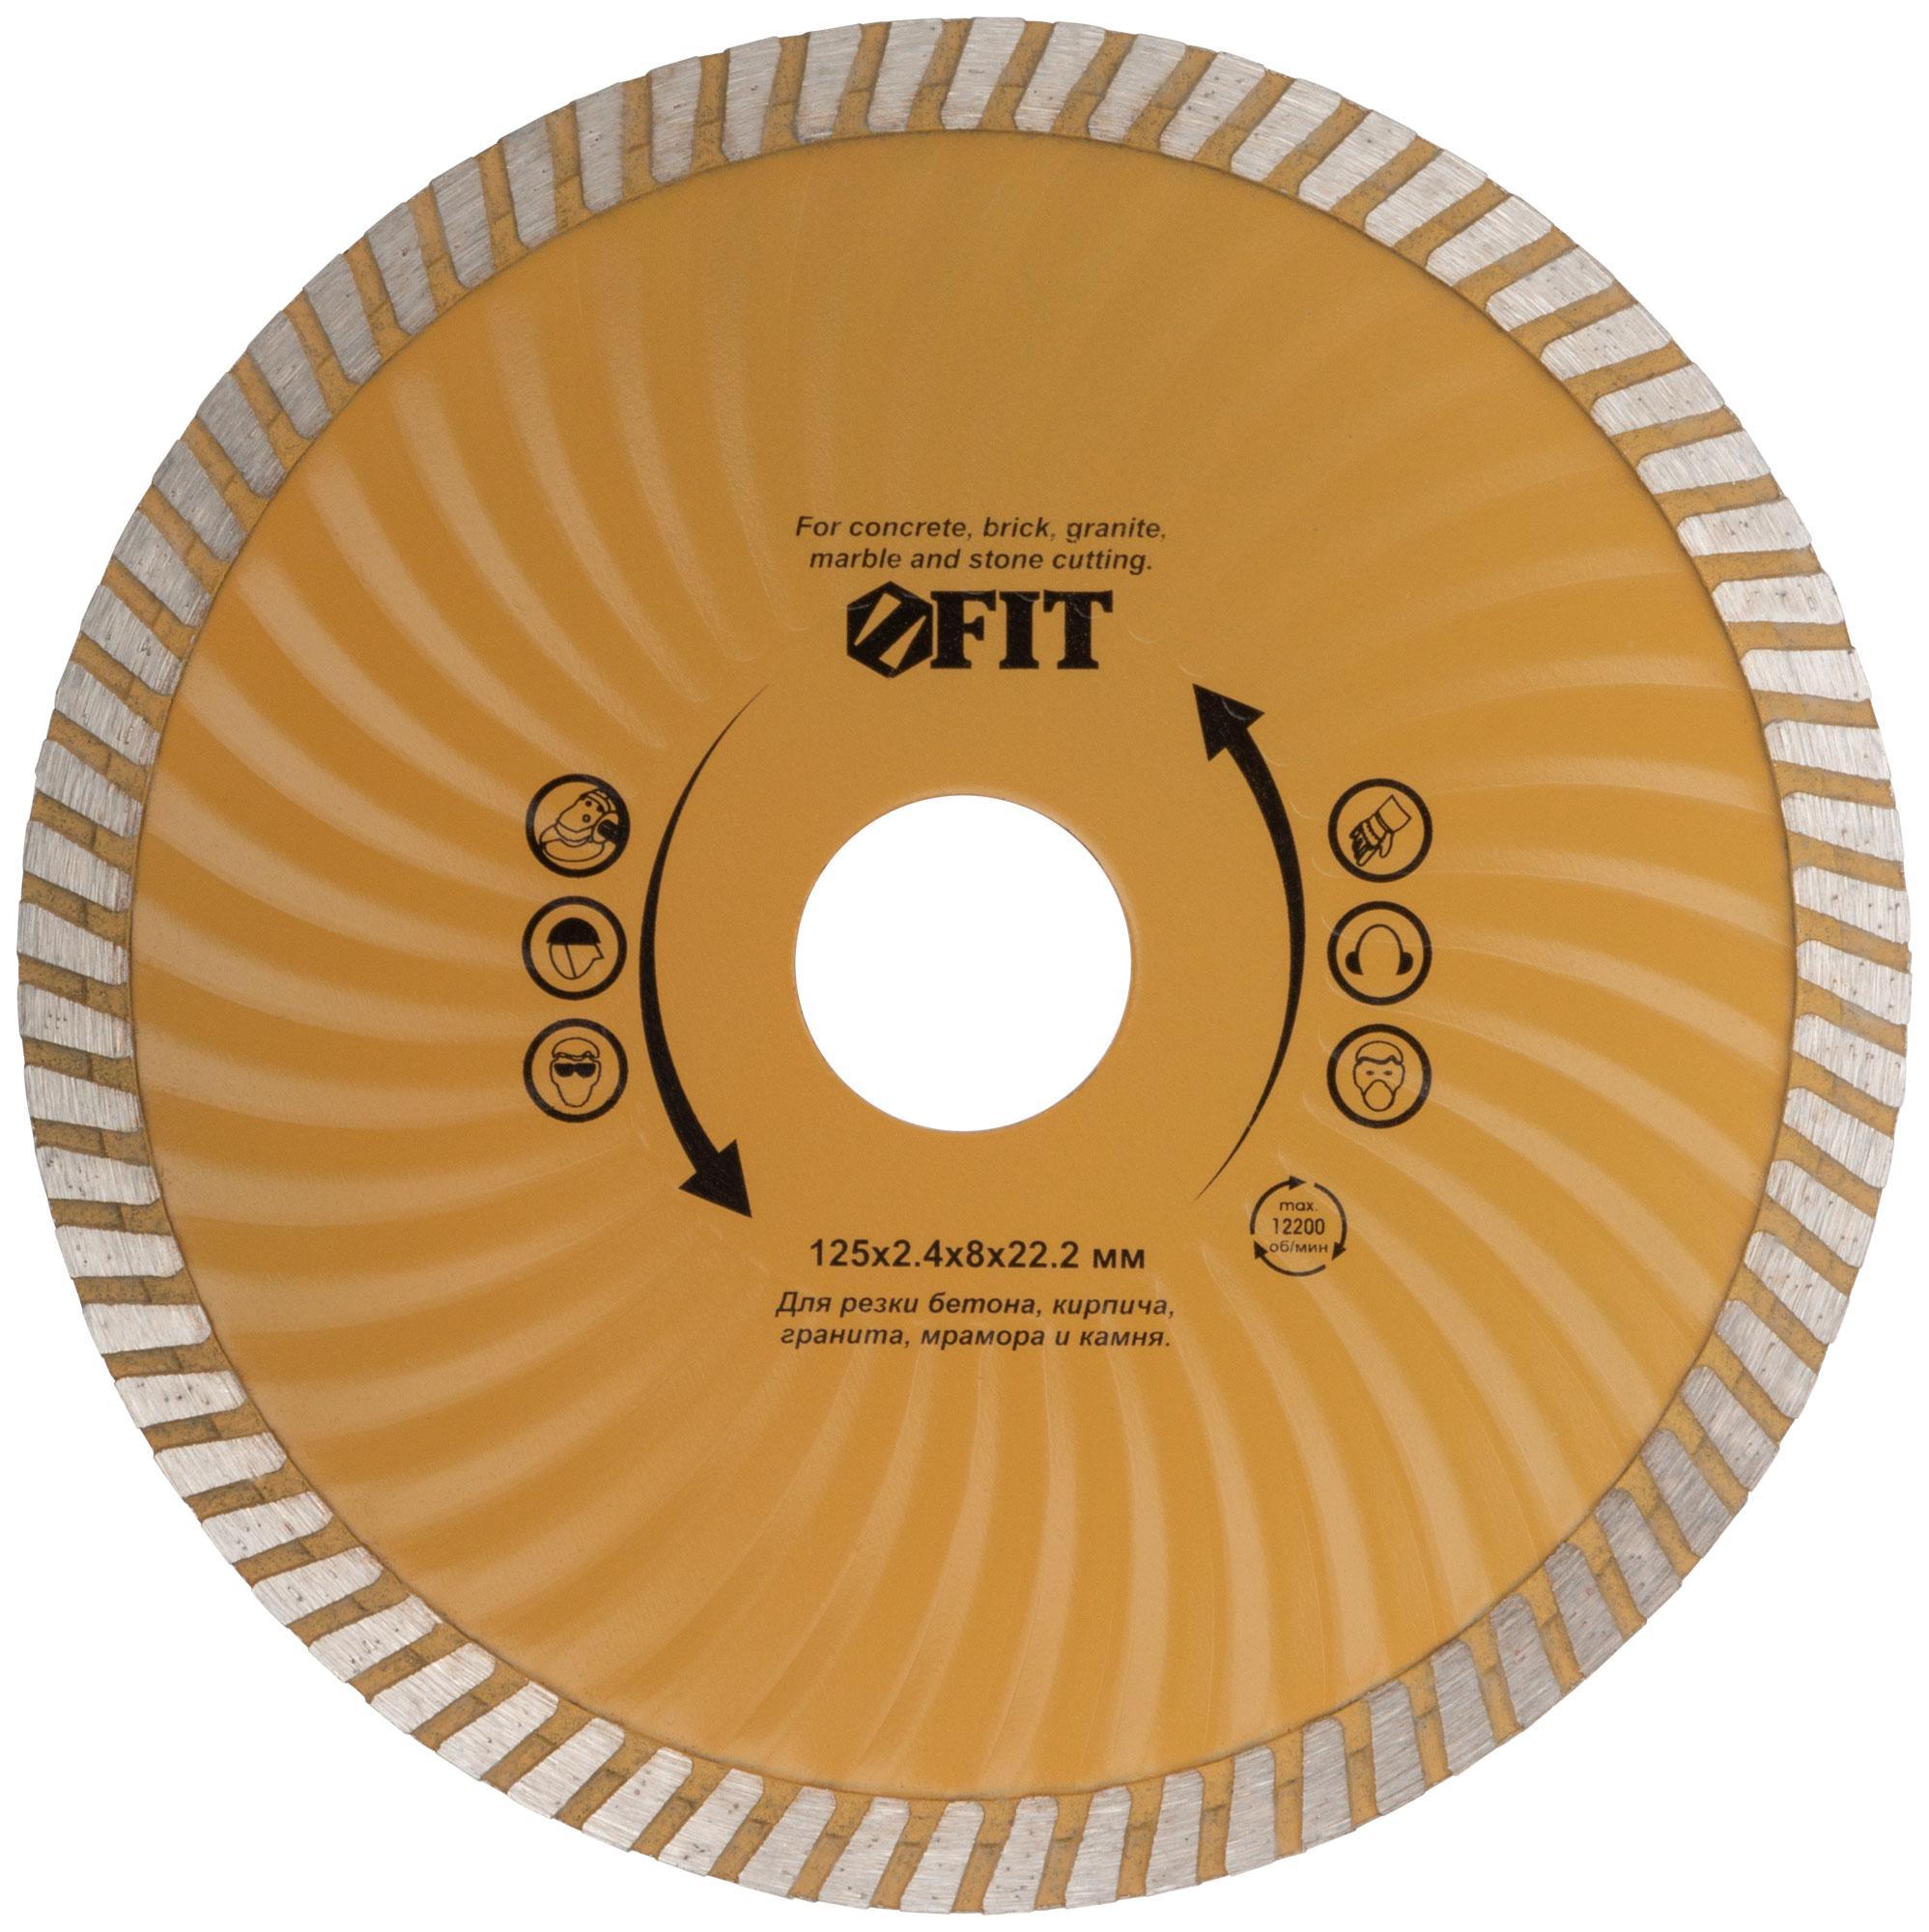 Круг алмазный Fit 37523 диск отрезной алмазный турбо 125х22 2mm 20007 ottom 125x22 2mm